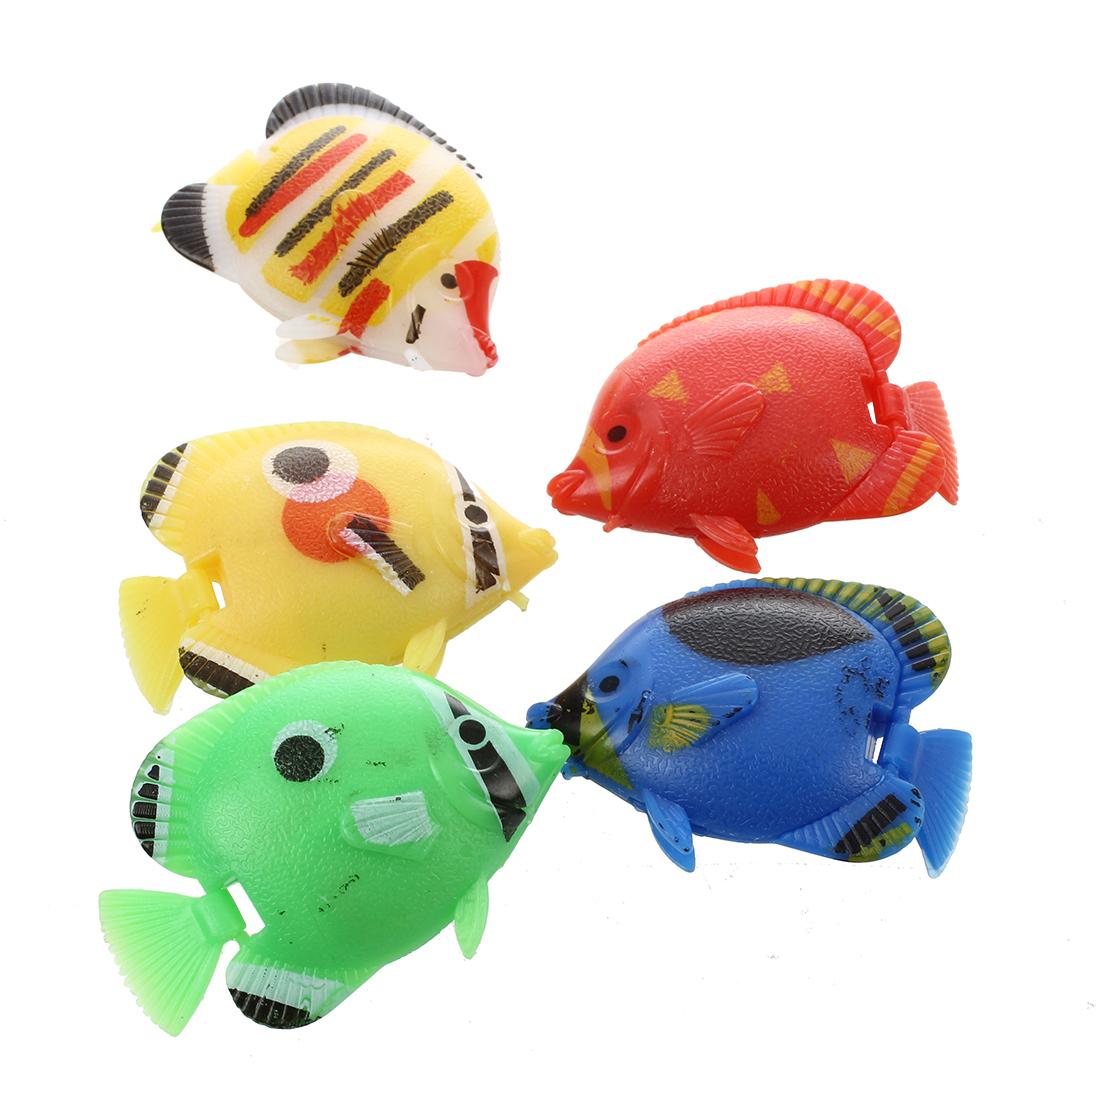 Aquarium Artificial Movable Tail Swimming Fish 5 Pcs N3 Ebay